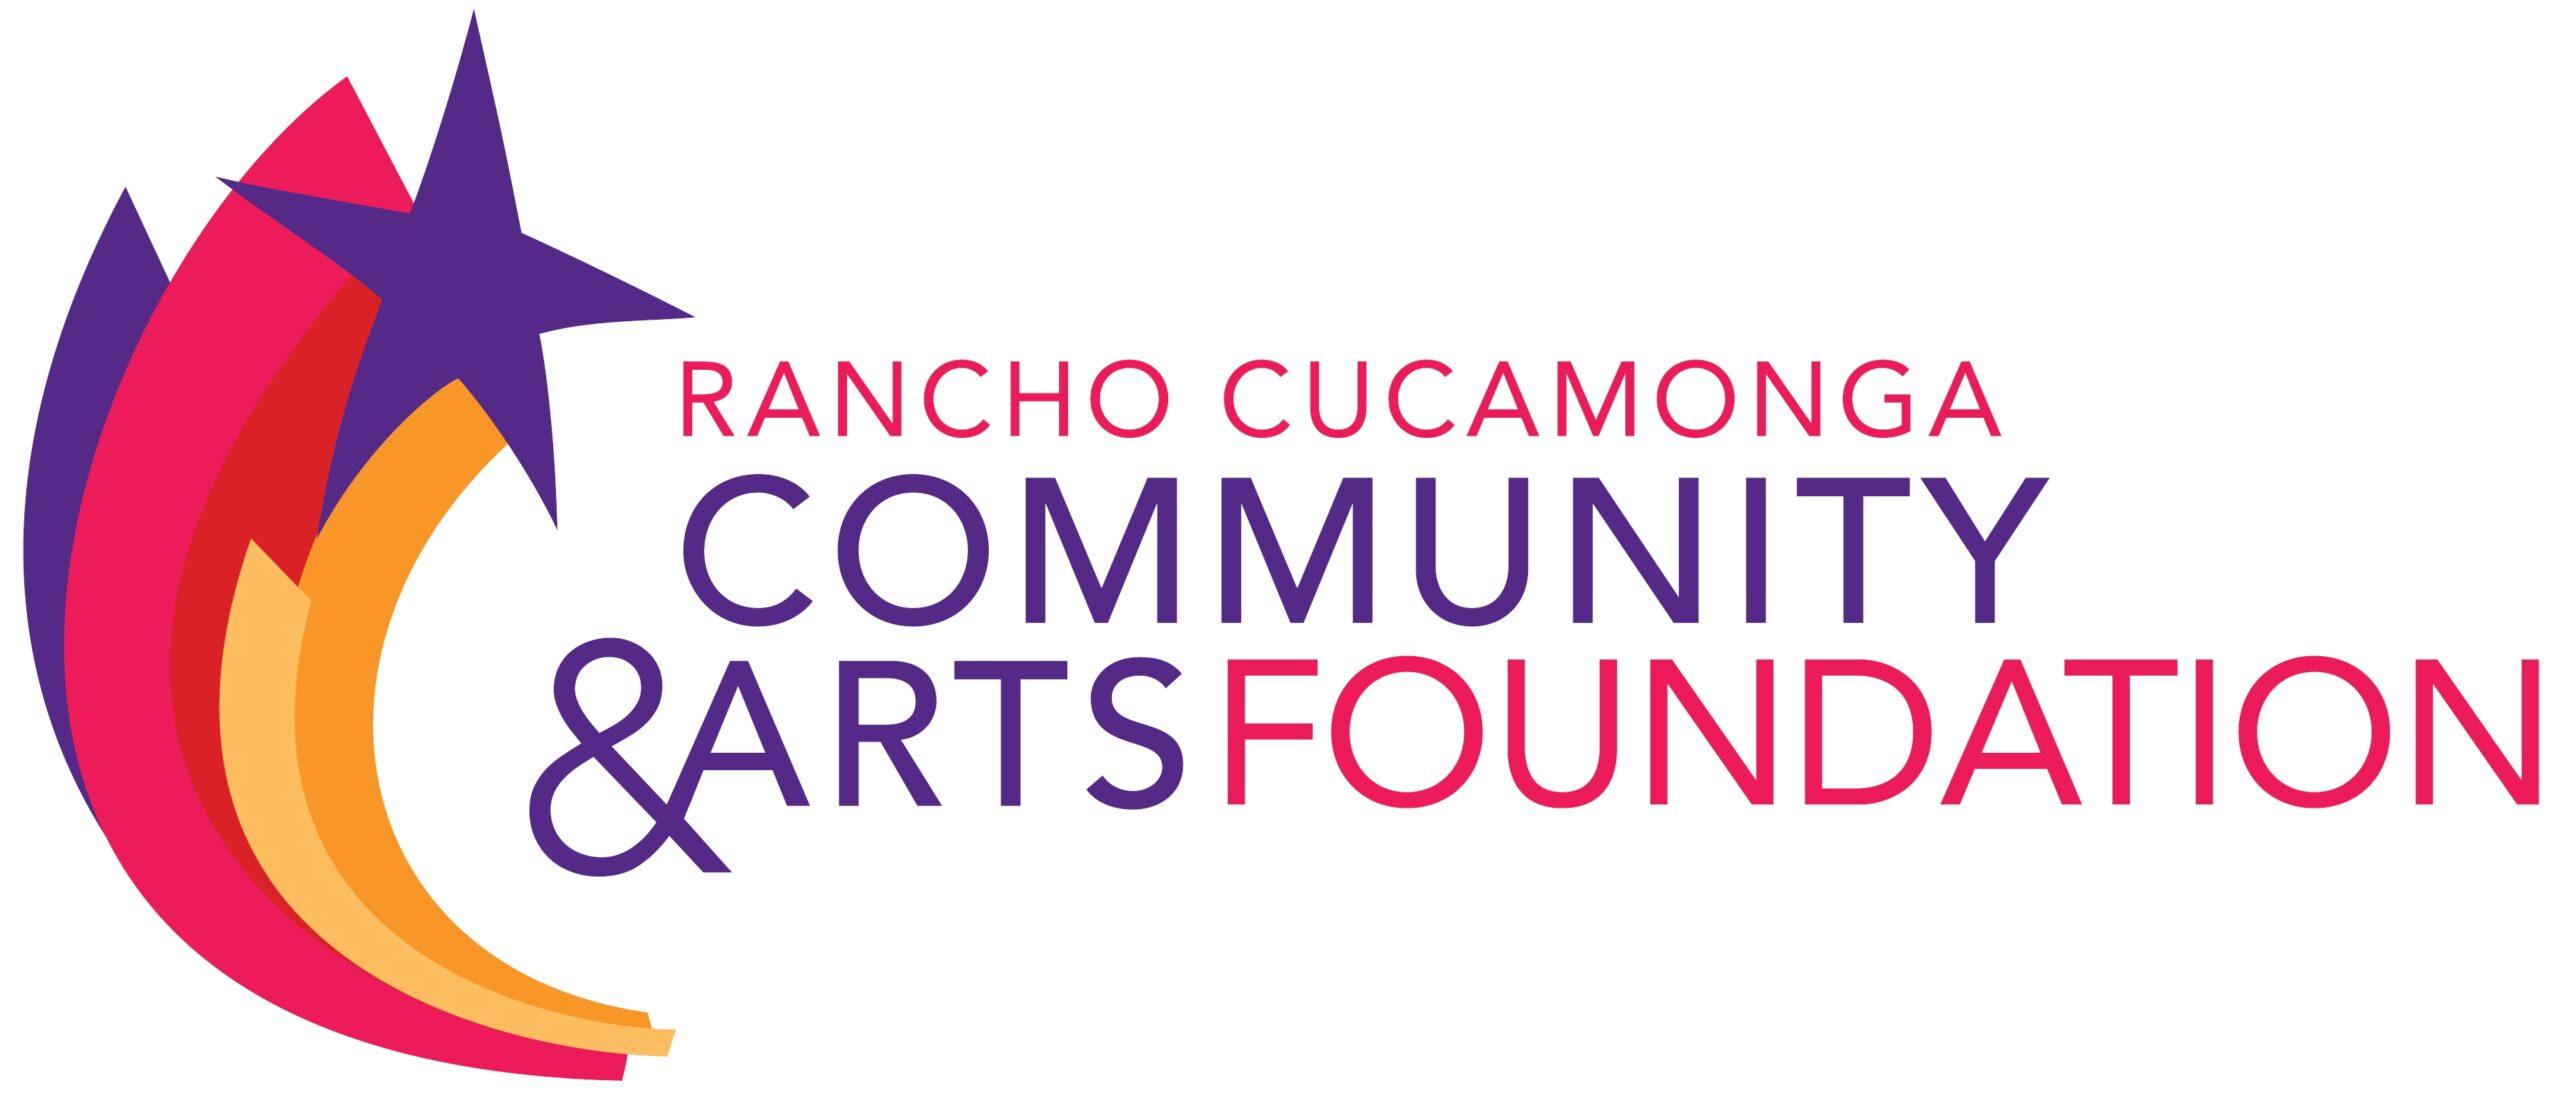 Rancho Cucamonga Community & Arts Foundation